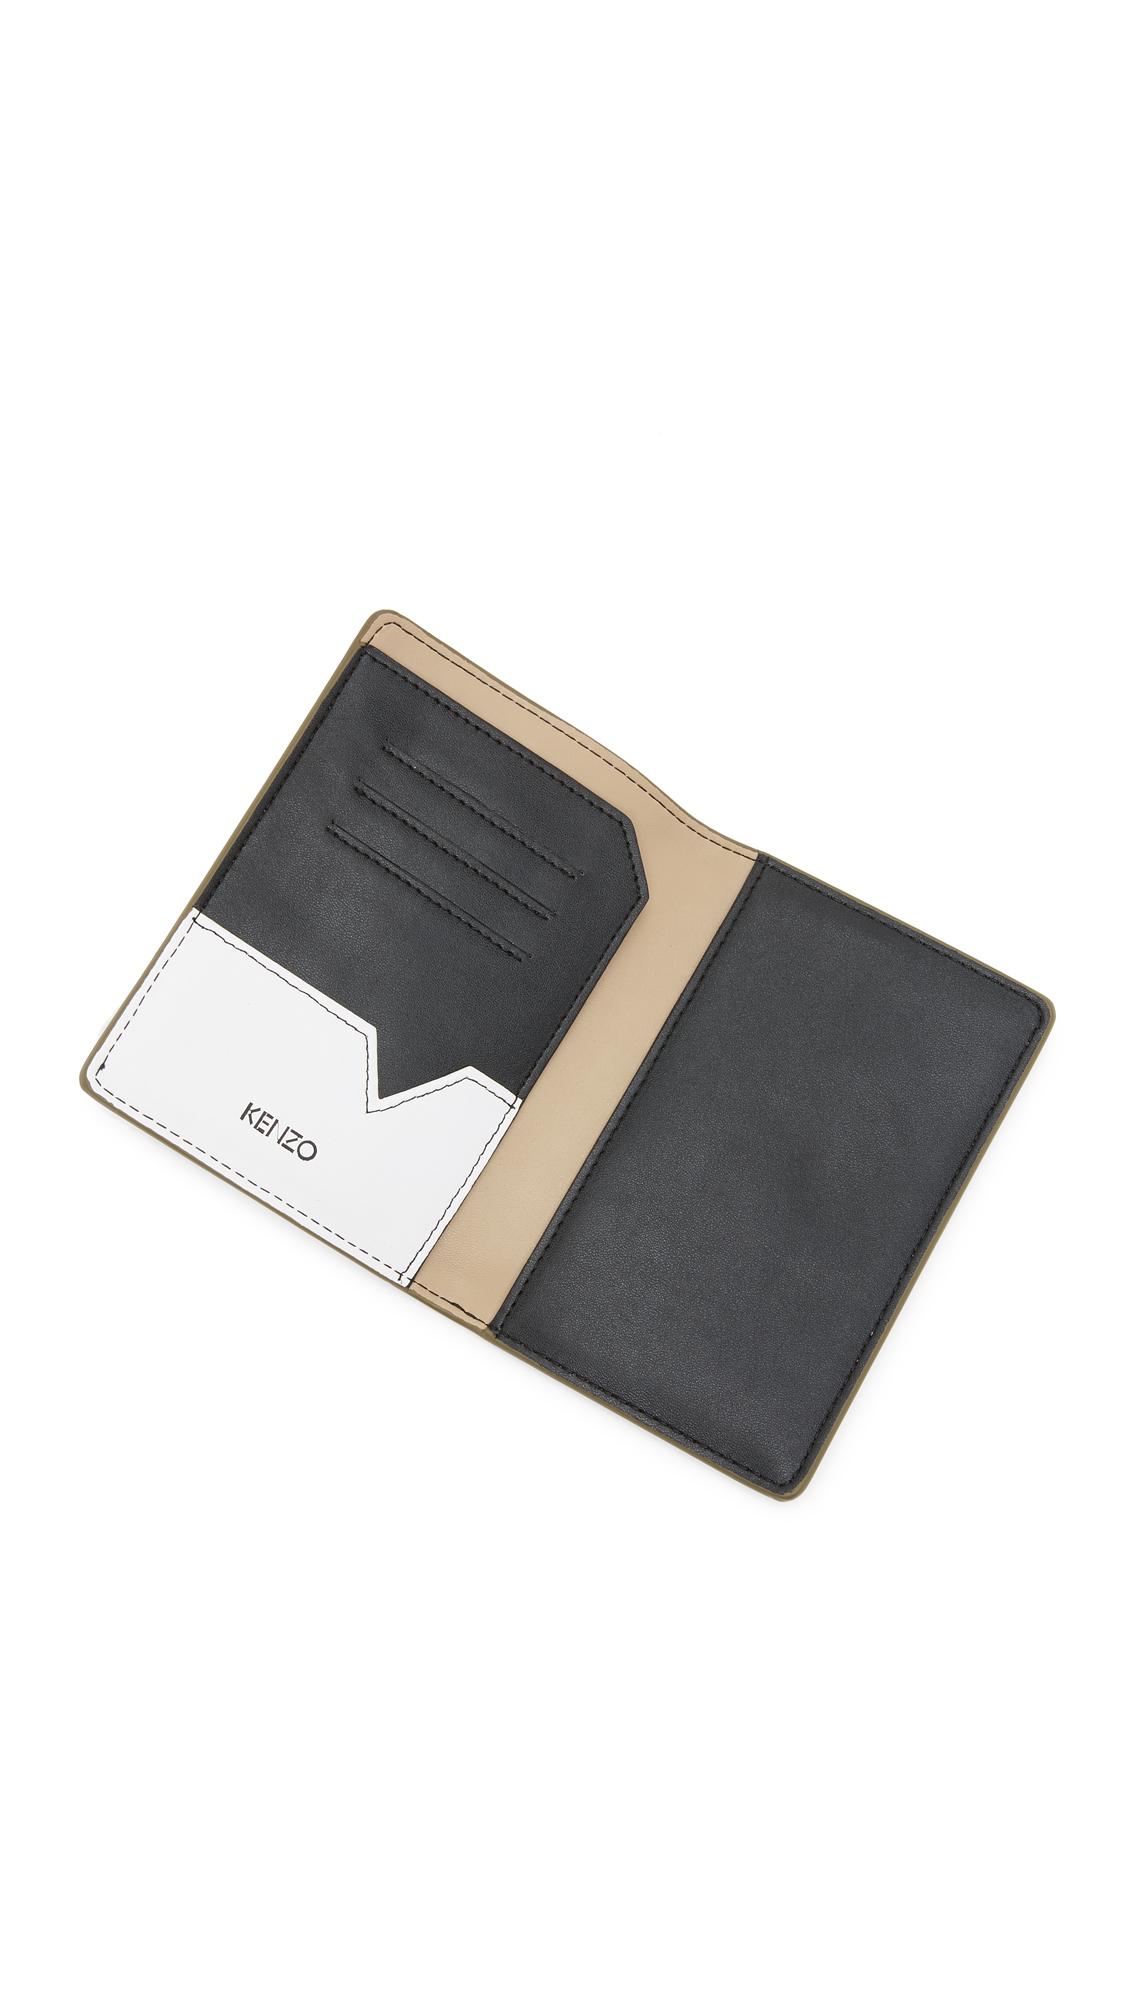 factory authentic 11dd8 0b17c KENZO Flying Logo Passport Holder | SHOPBOP